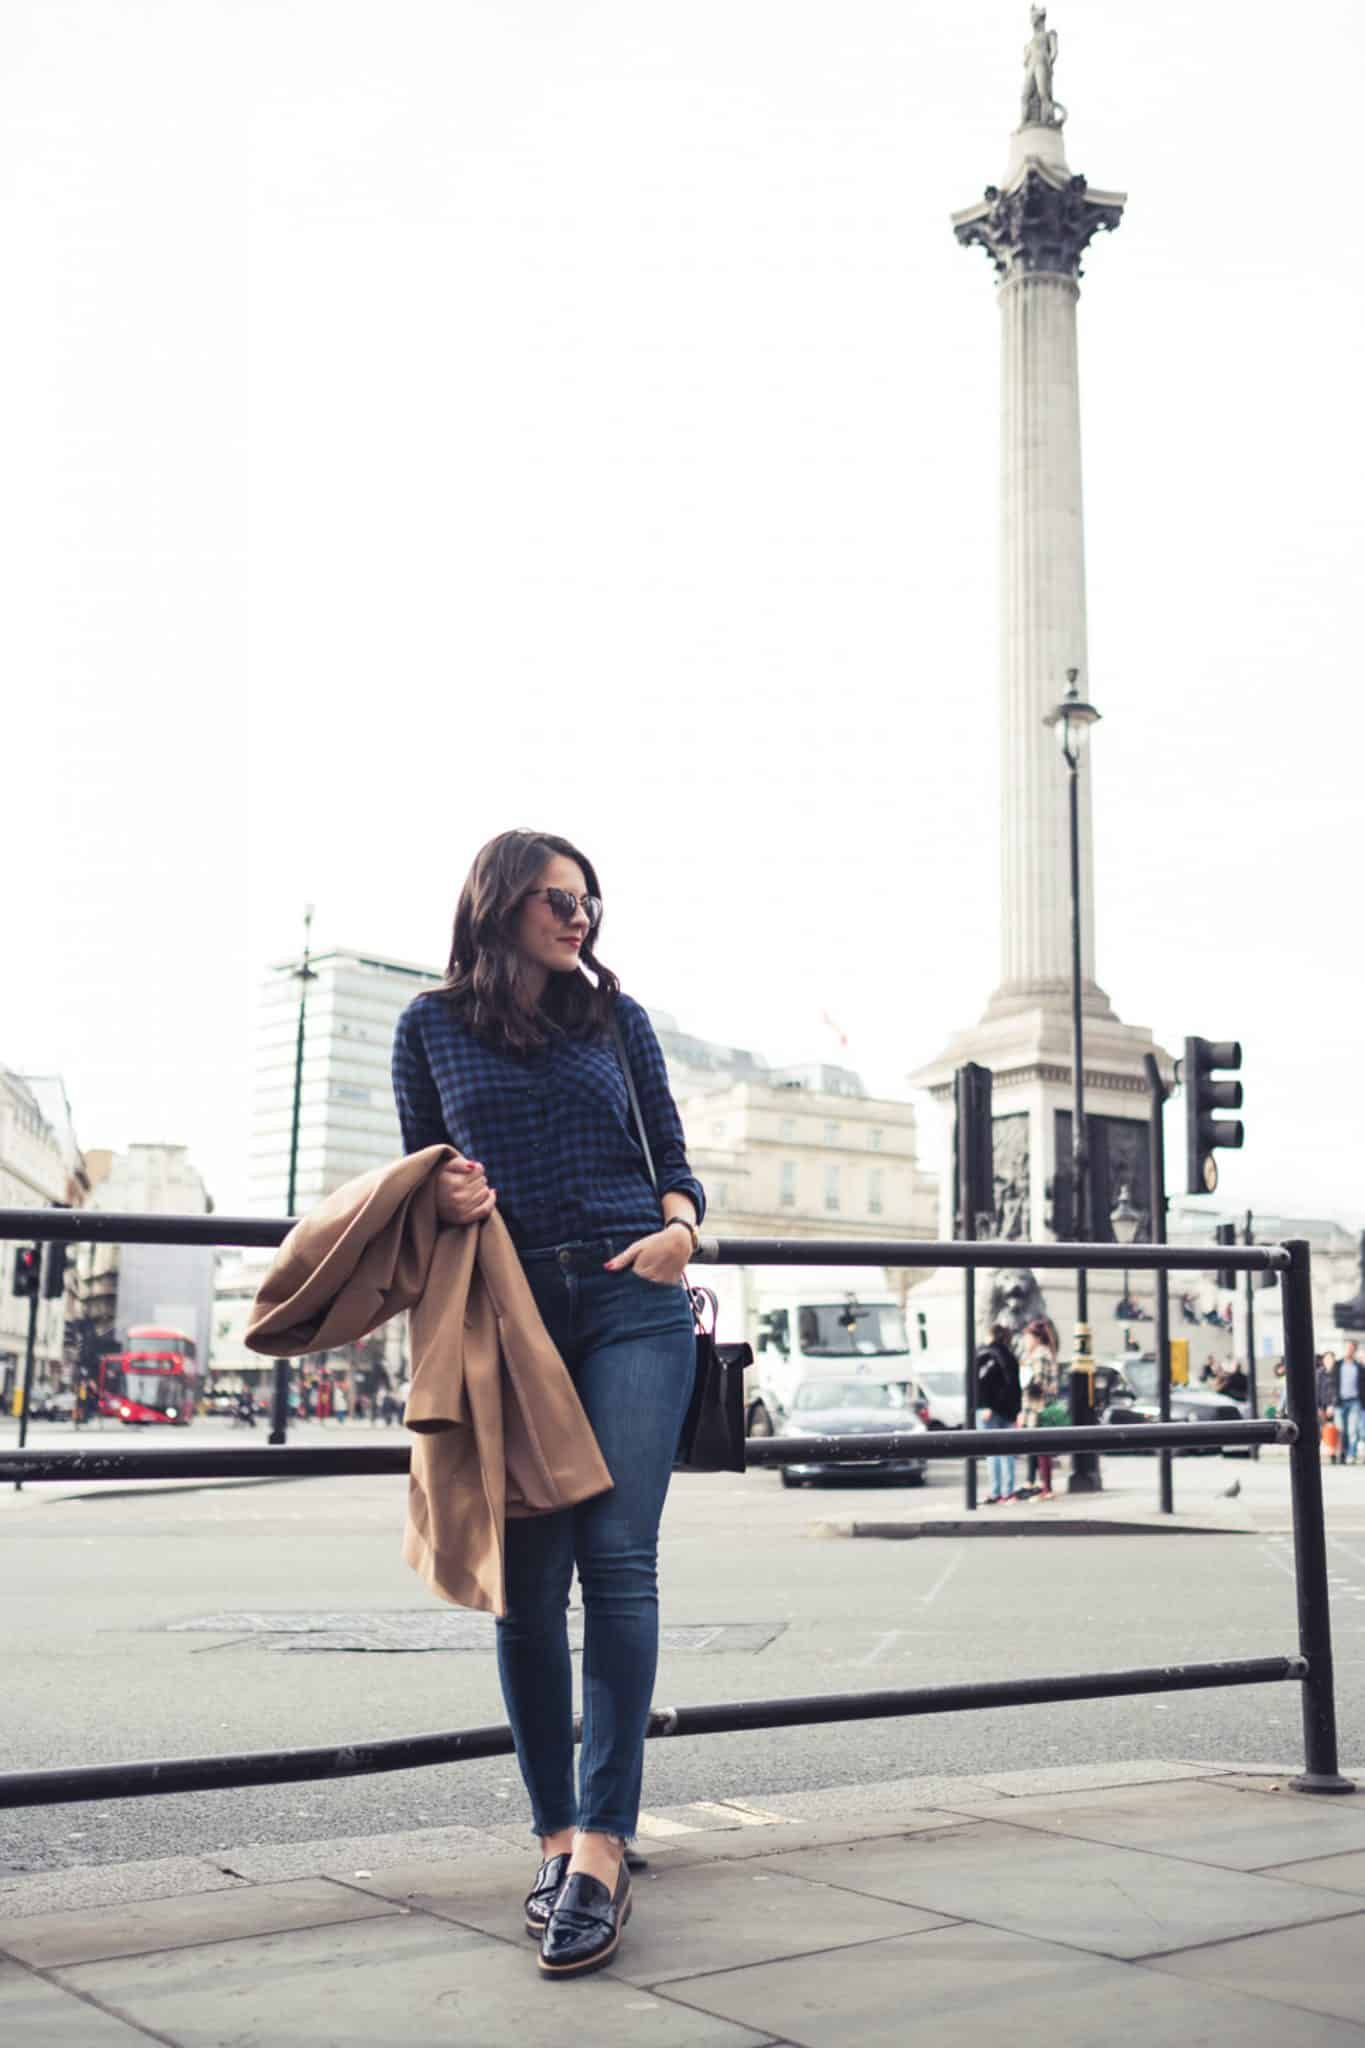 casual london street style, trench coat - My Style Vita @mystylevita